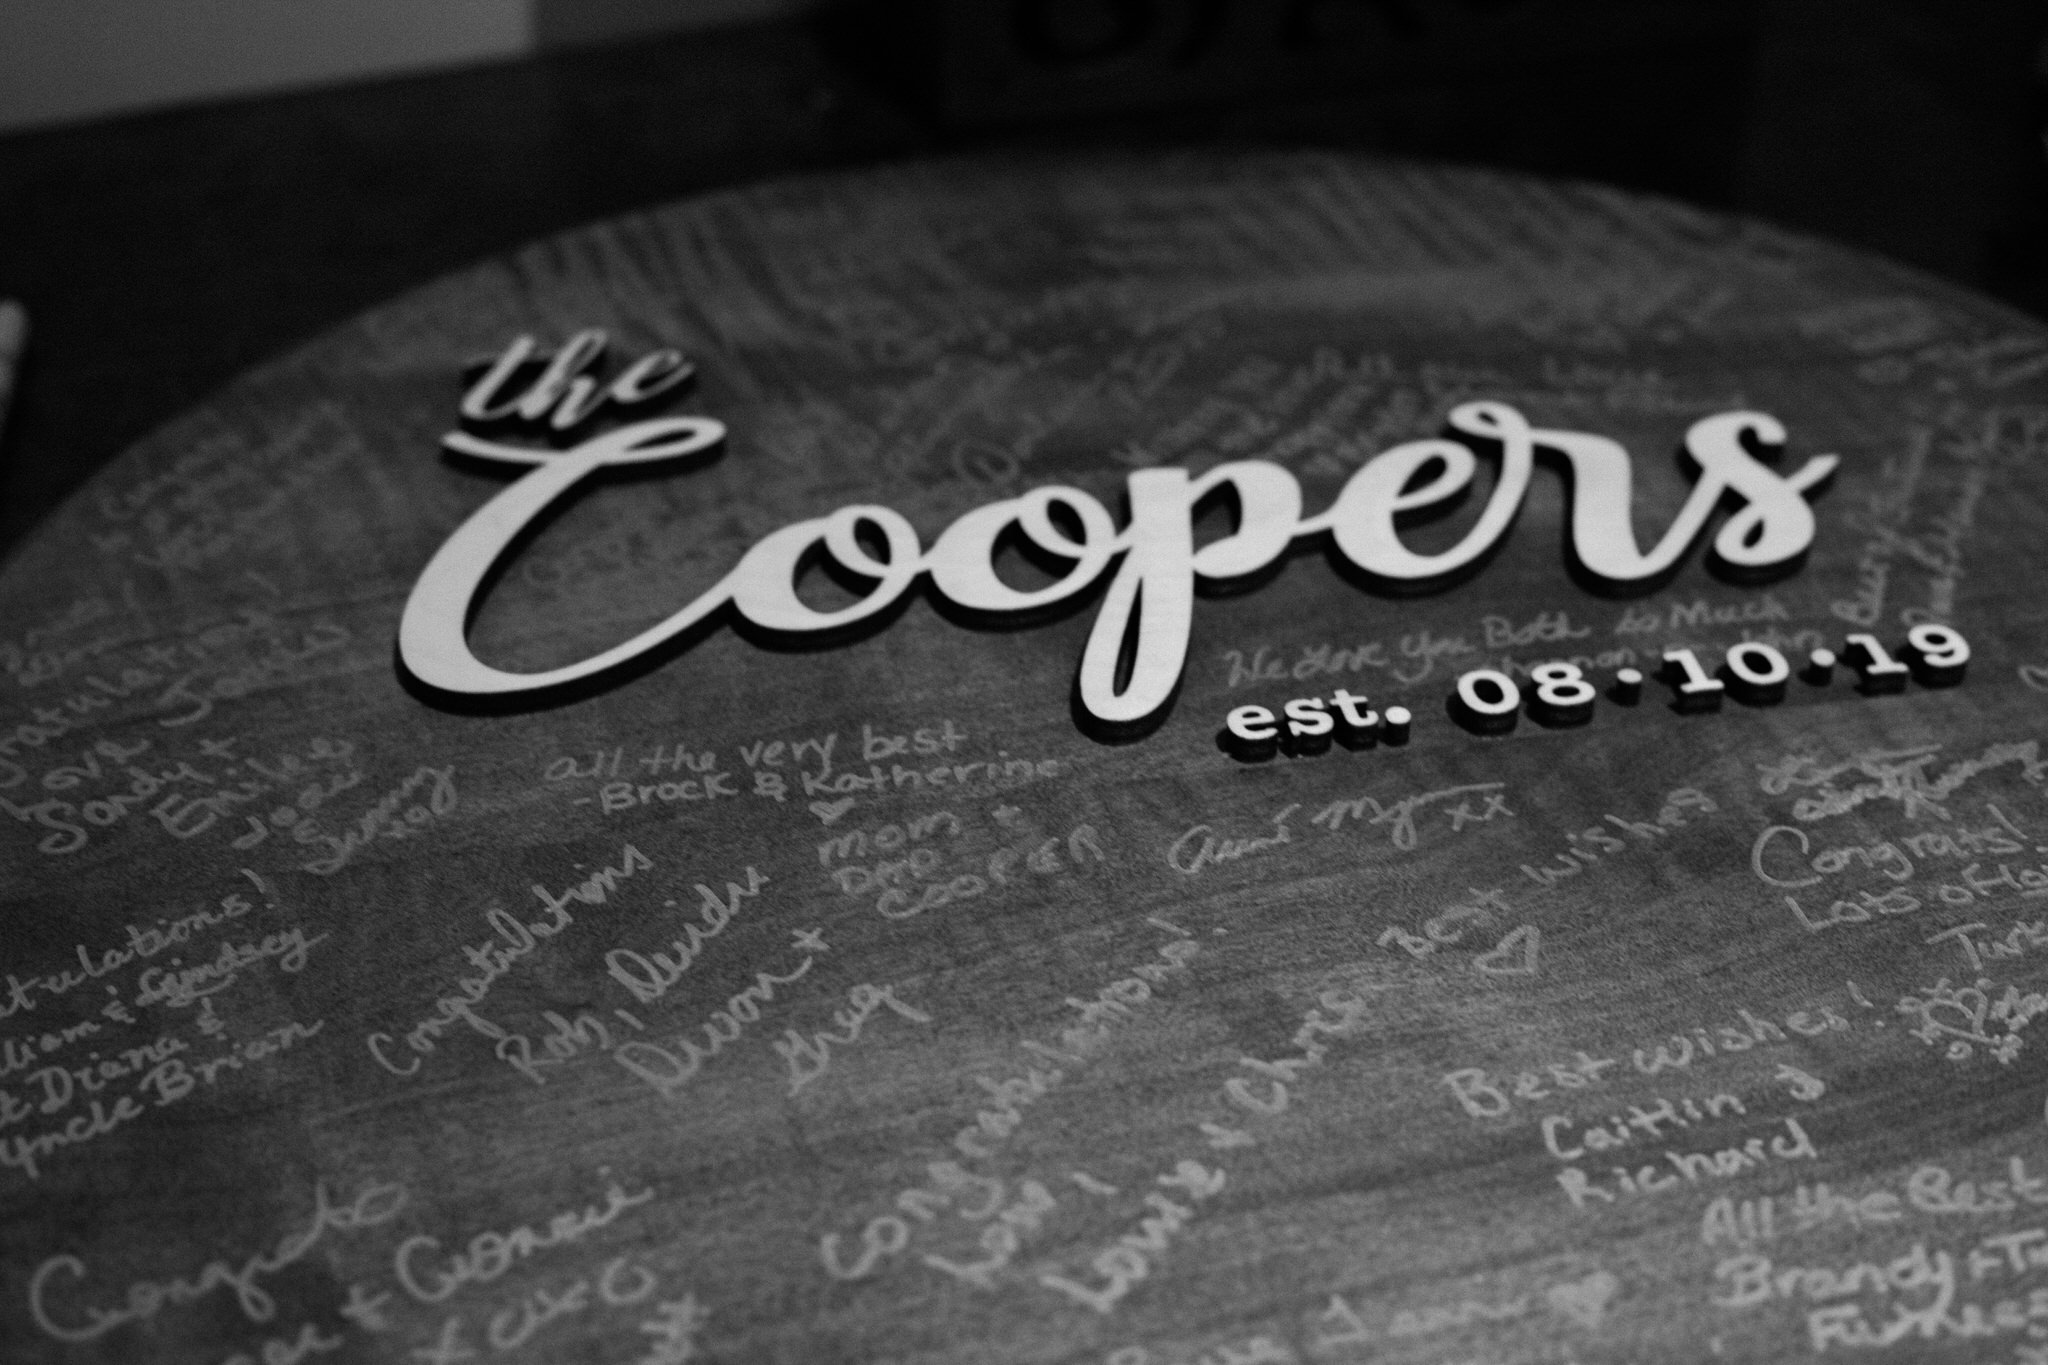 Brock Street Brewing Co. Wedding - reception details